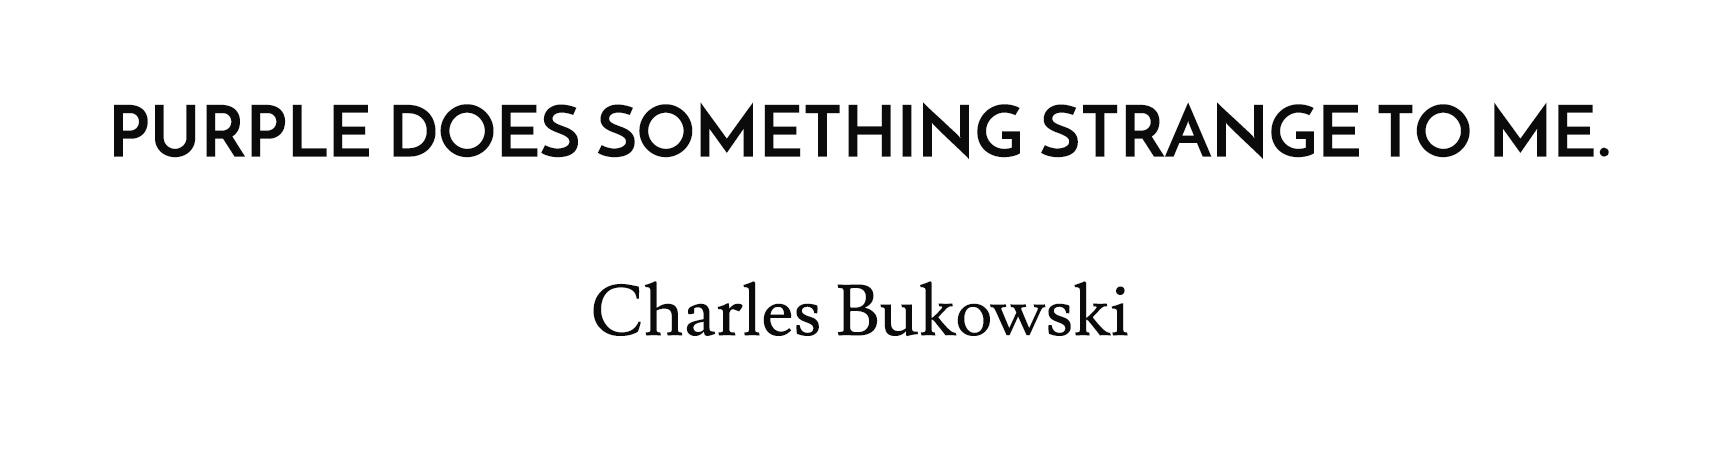 bukowski2.jpg